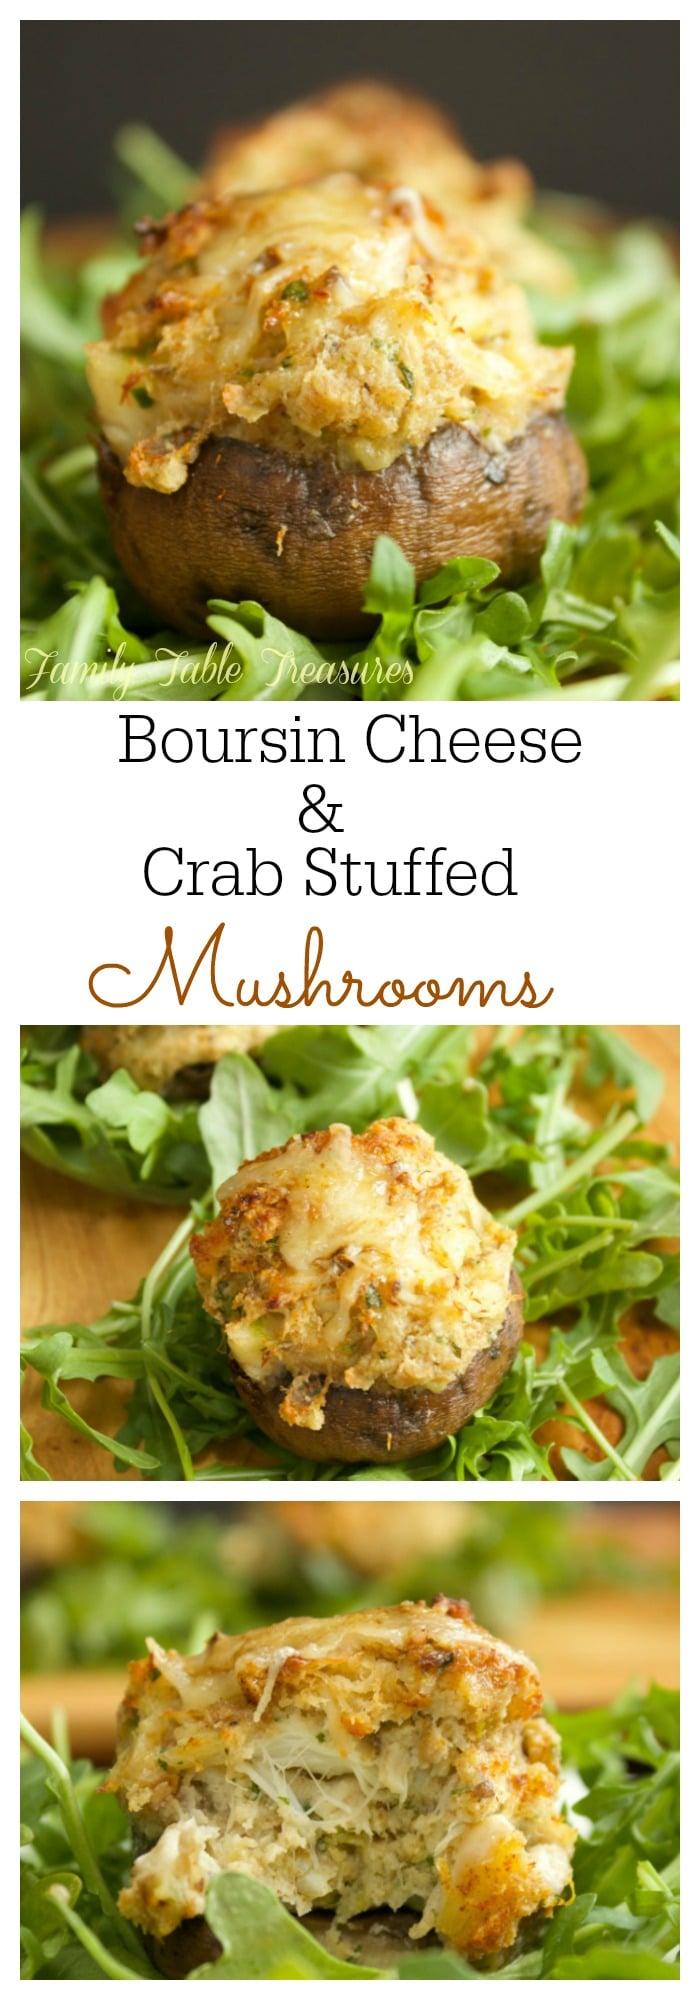 Boursin Cheese & Crab Stuffed Mushrooms - Family Table ...